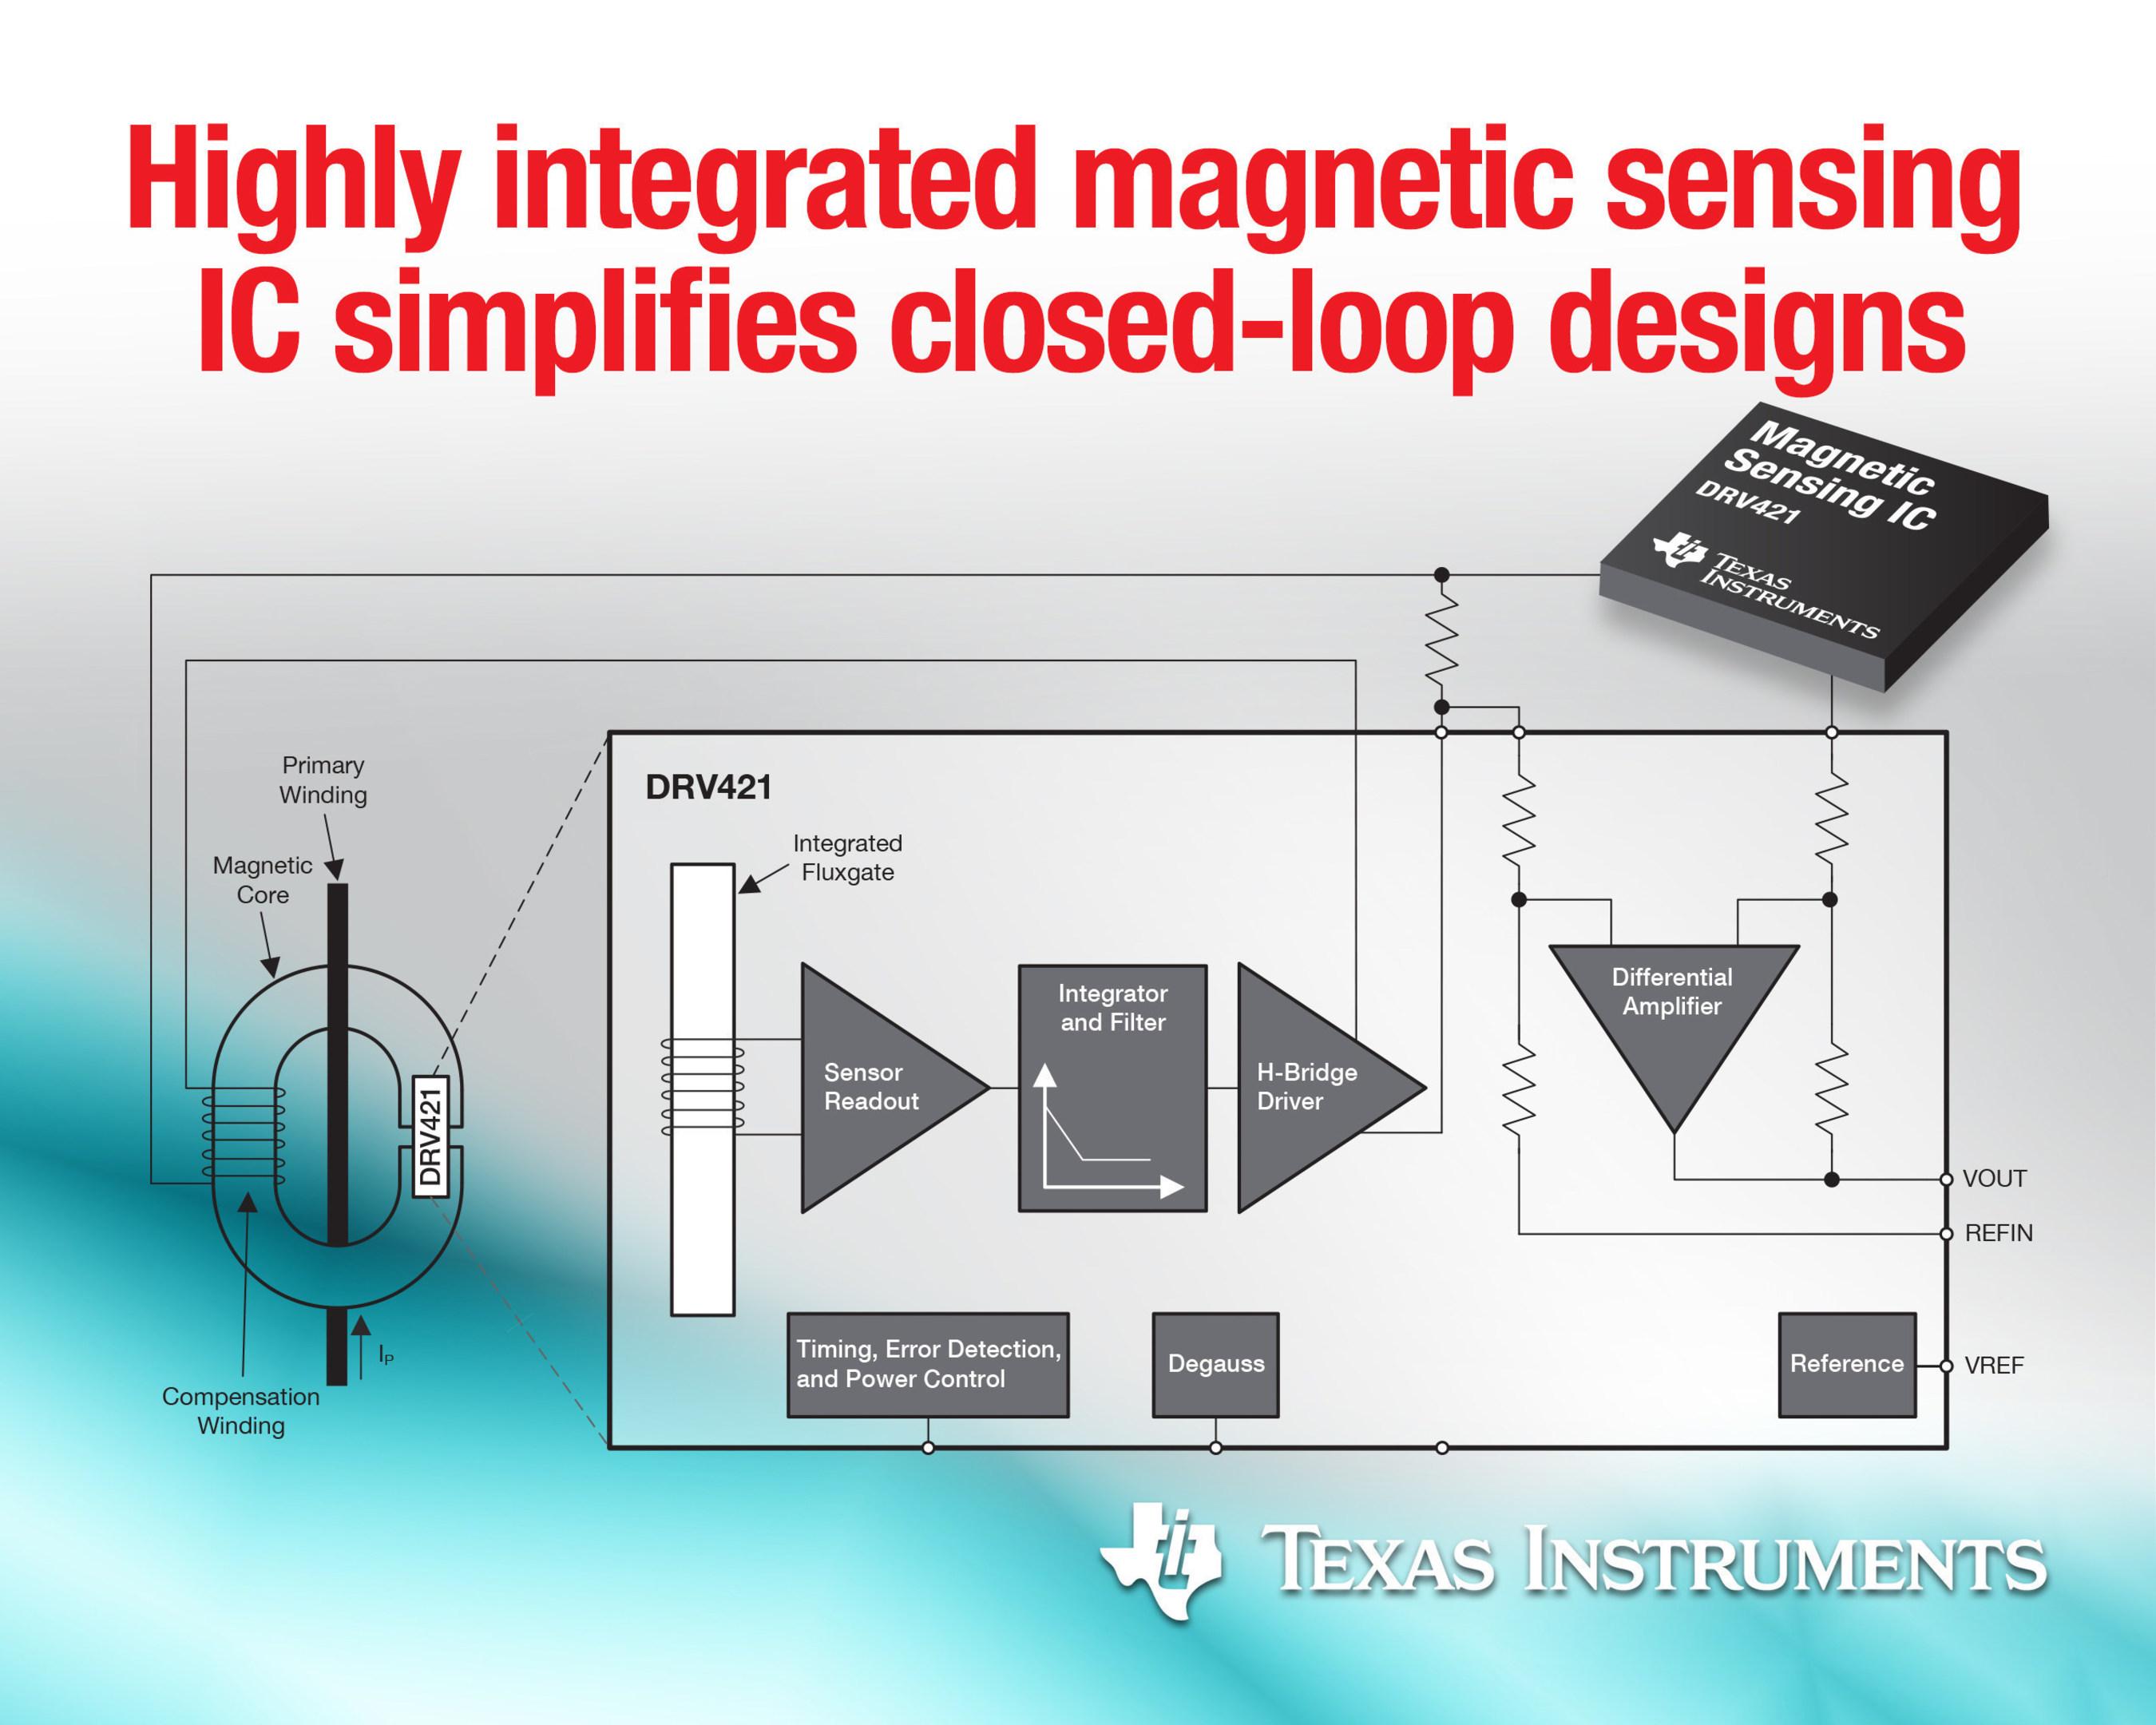 TI's DRV421 magnetic sensing IC